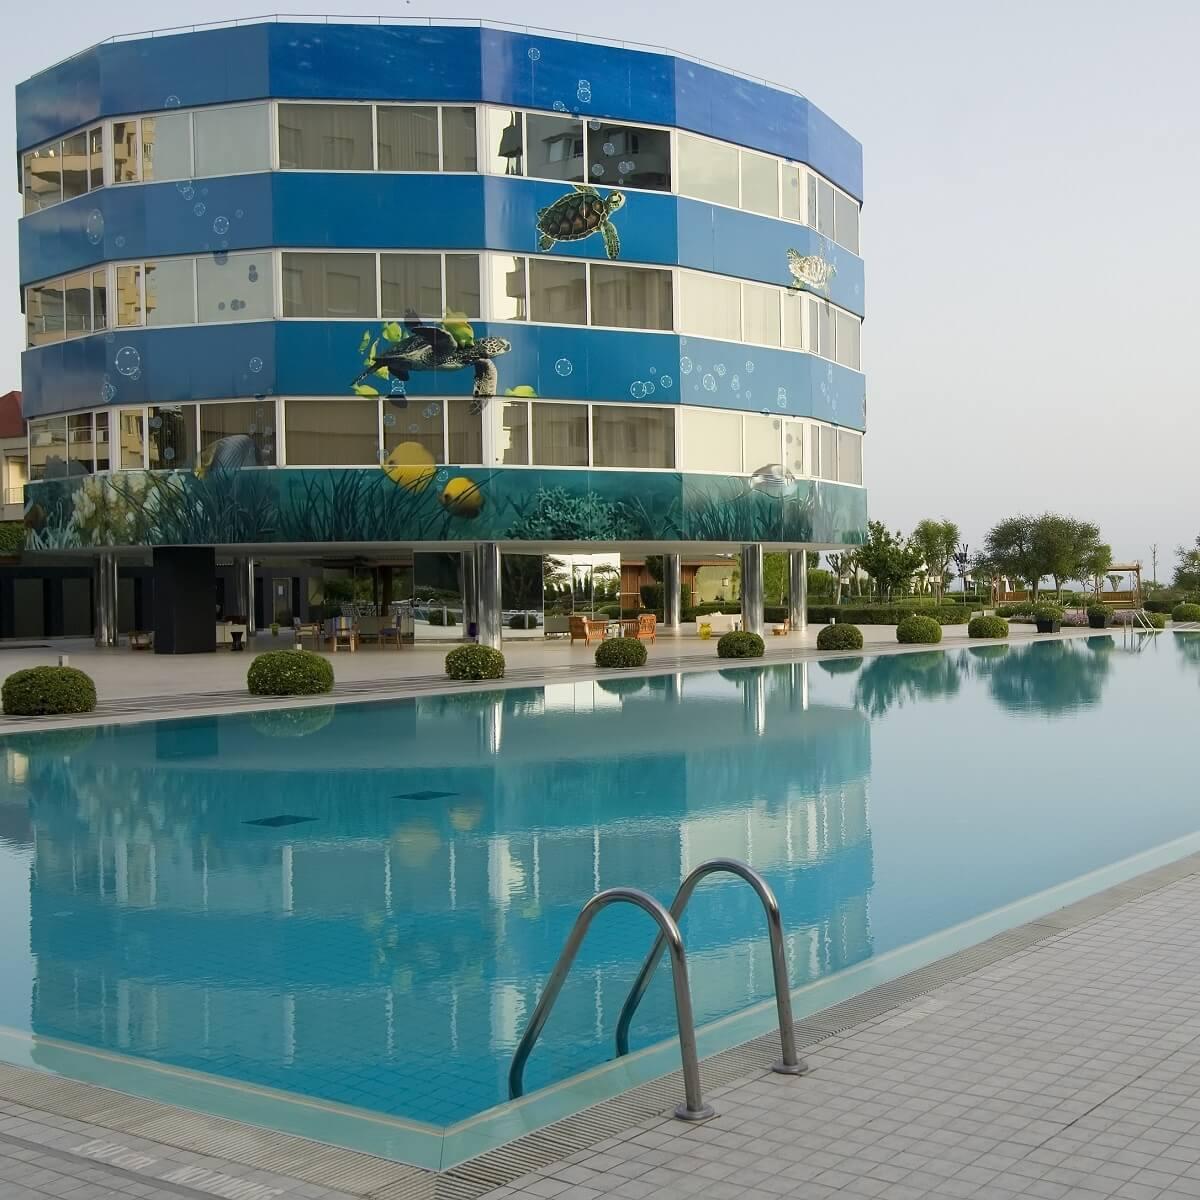 Hôtel Marmara Antalya - Turquie